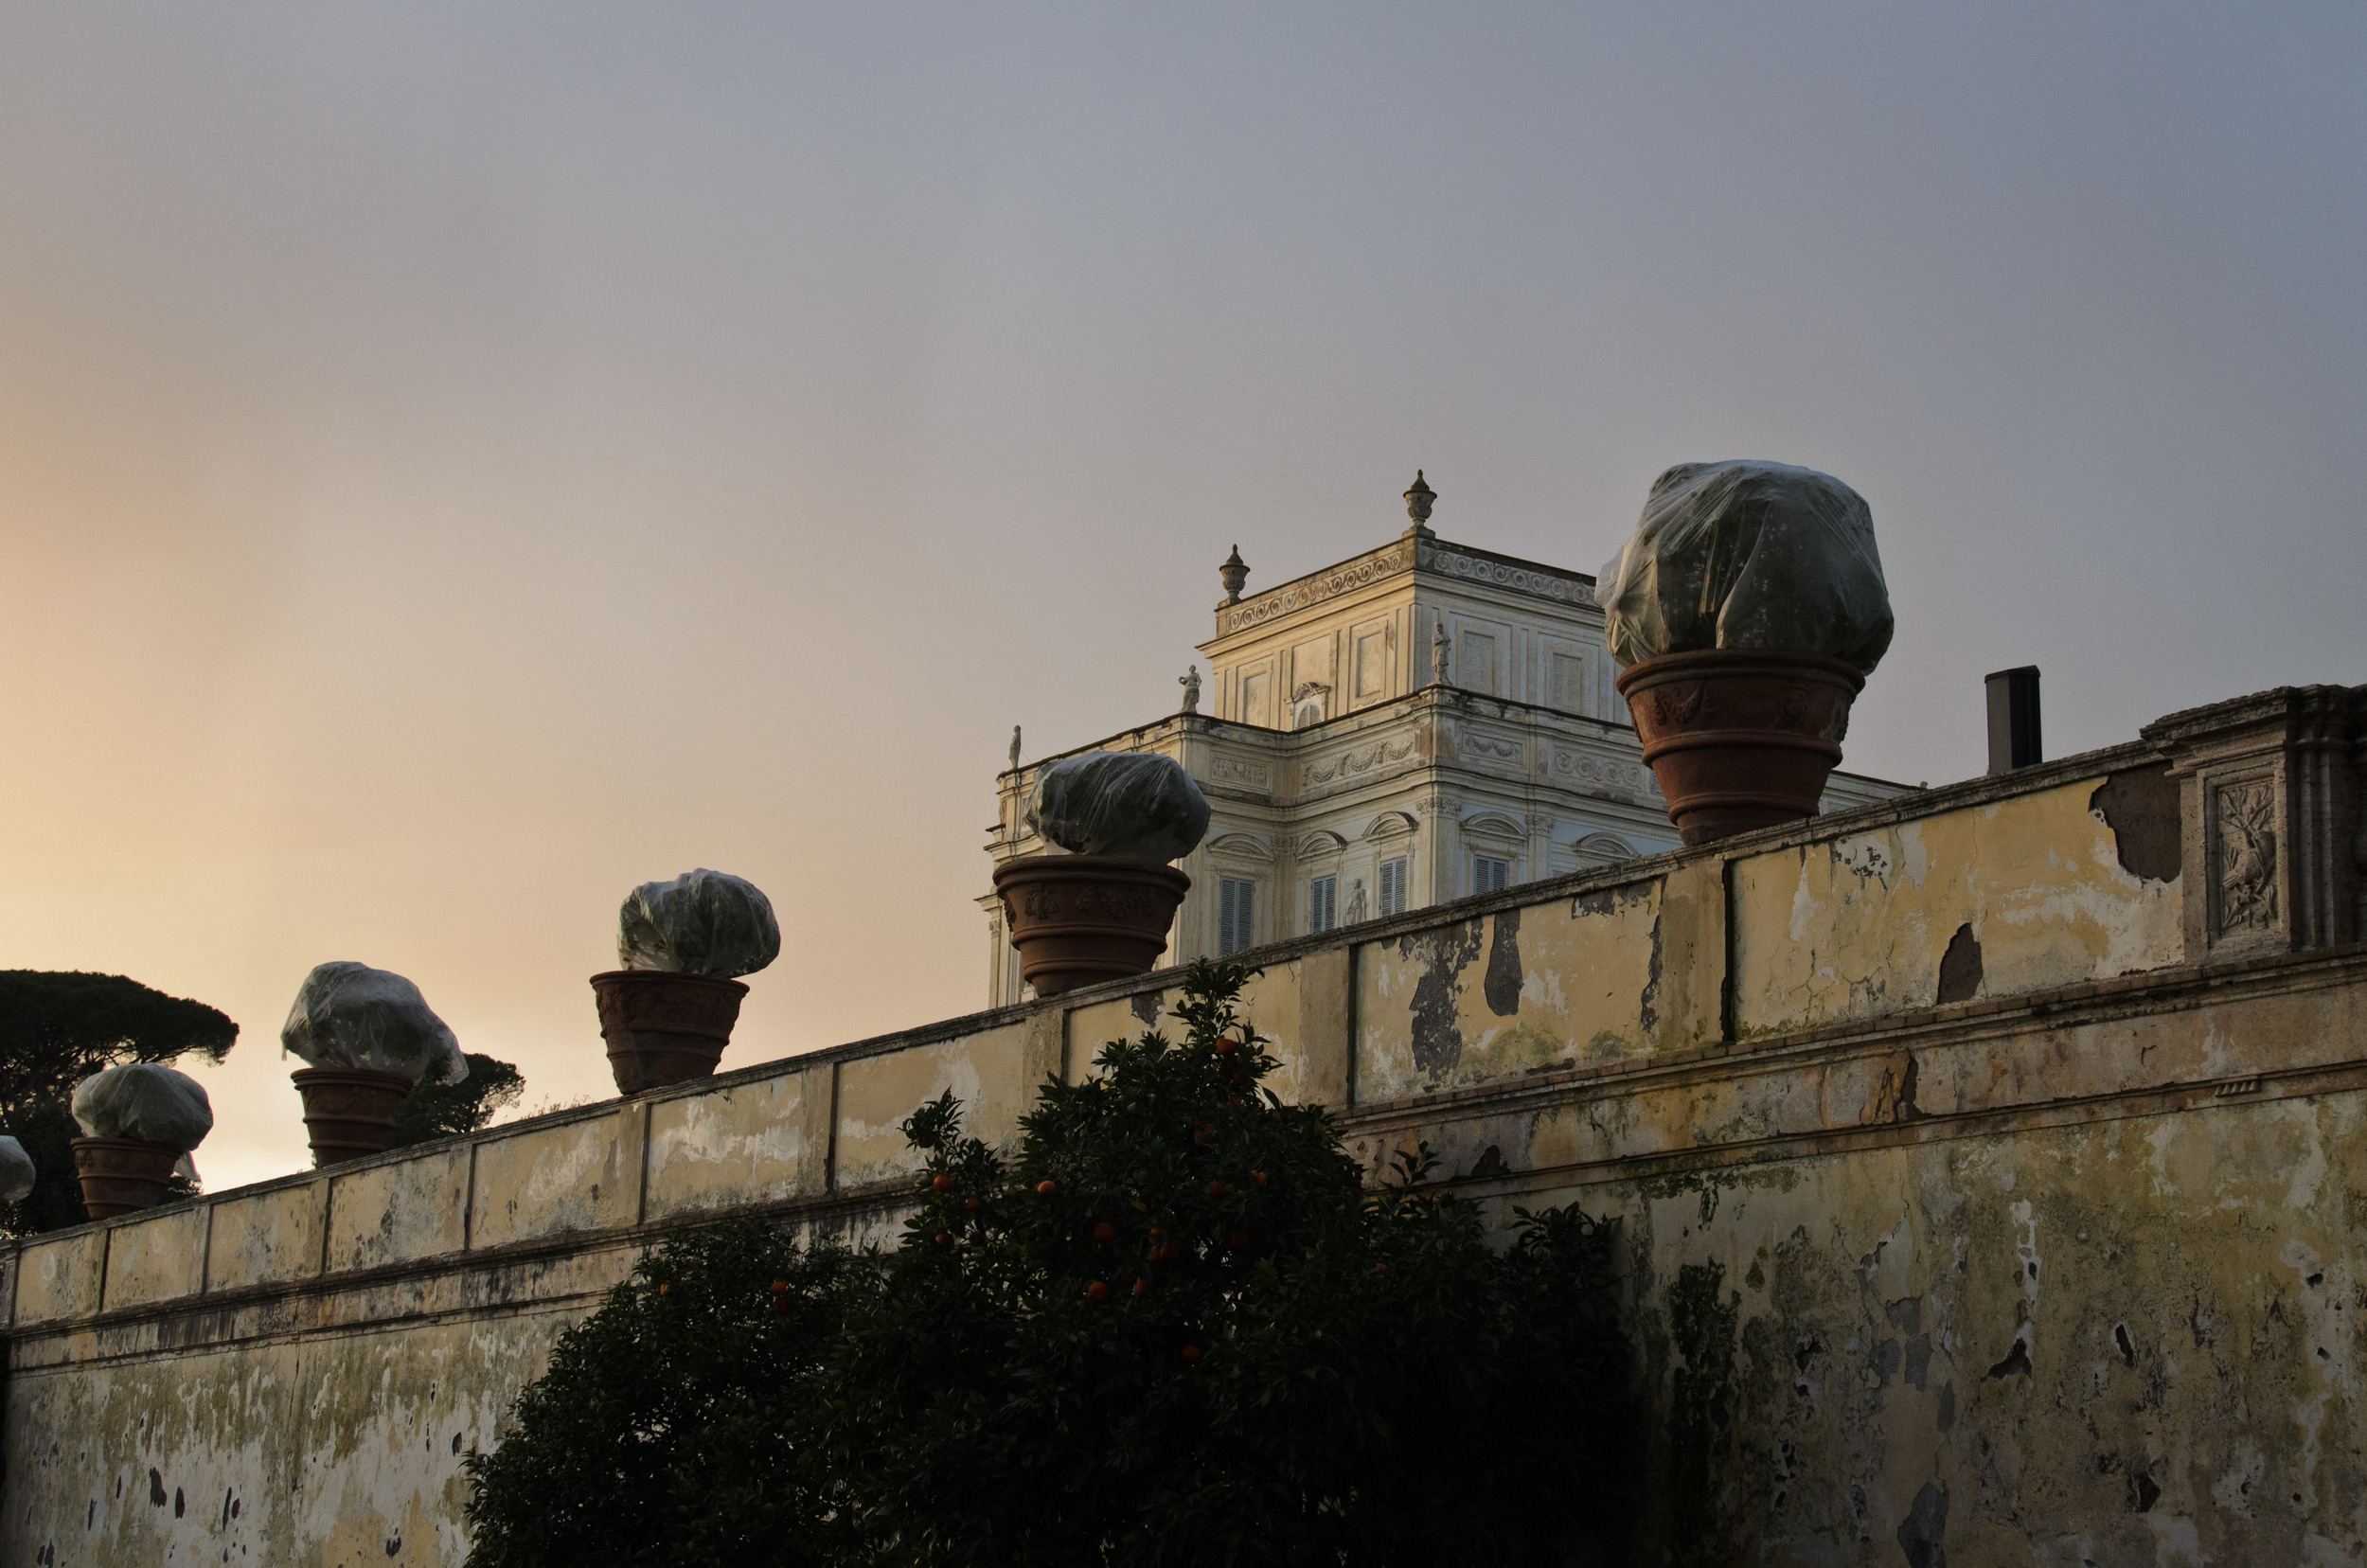 Villa Doria Pamphili at sunset